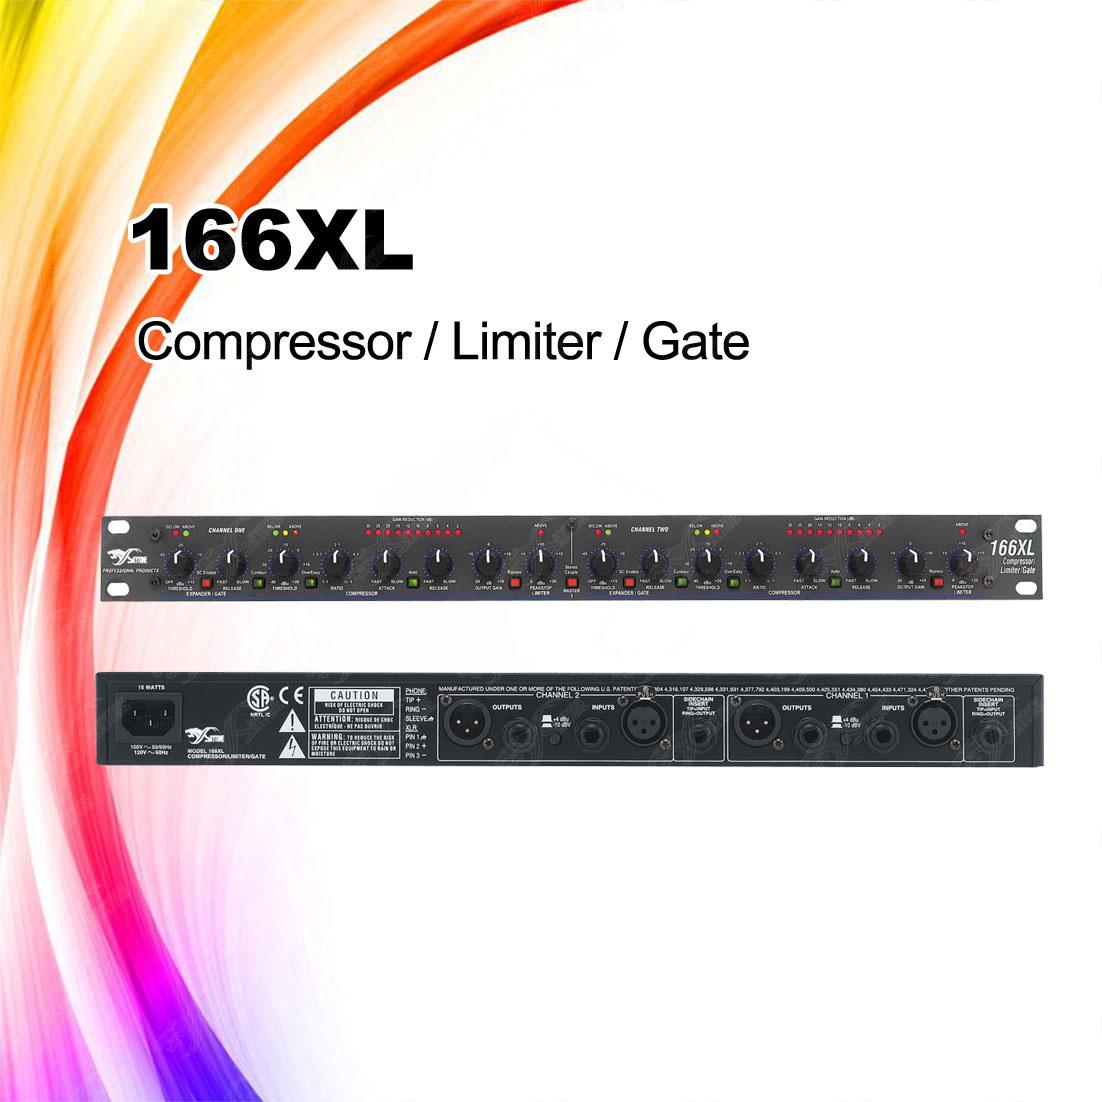 China 166XL Audio Compressor, Audio Limiter - China Compressor, Limiter